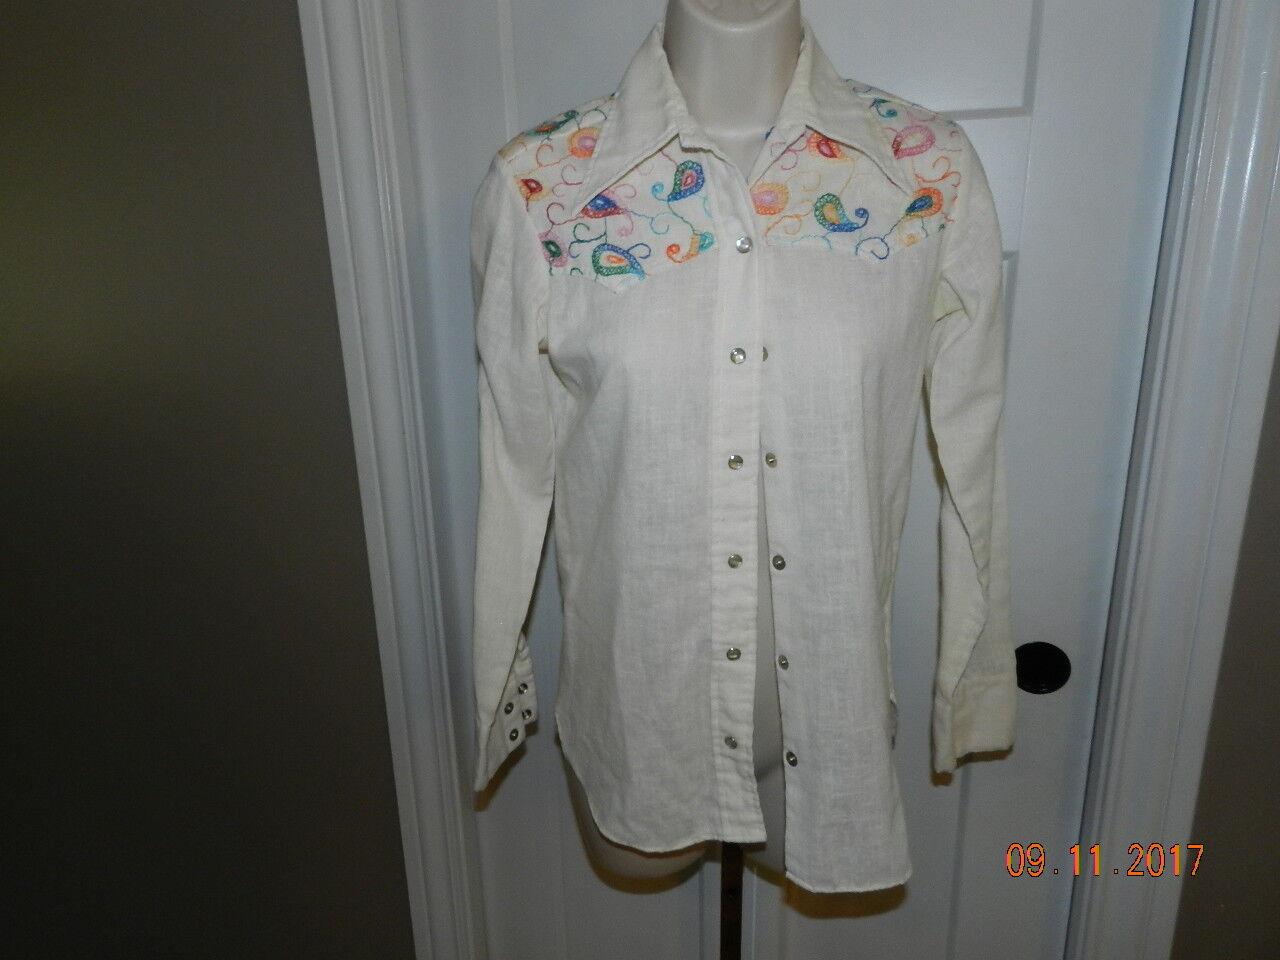 Wrangler VTG Western IVORY Shirt Woherren Größe 30 USA Made Embroidery Pearl snap